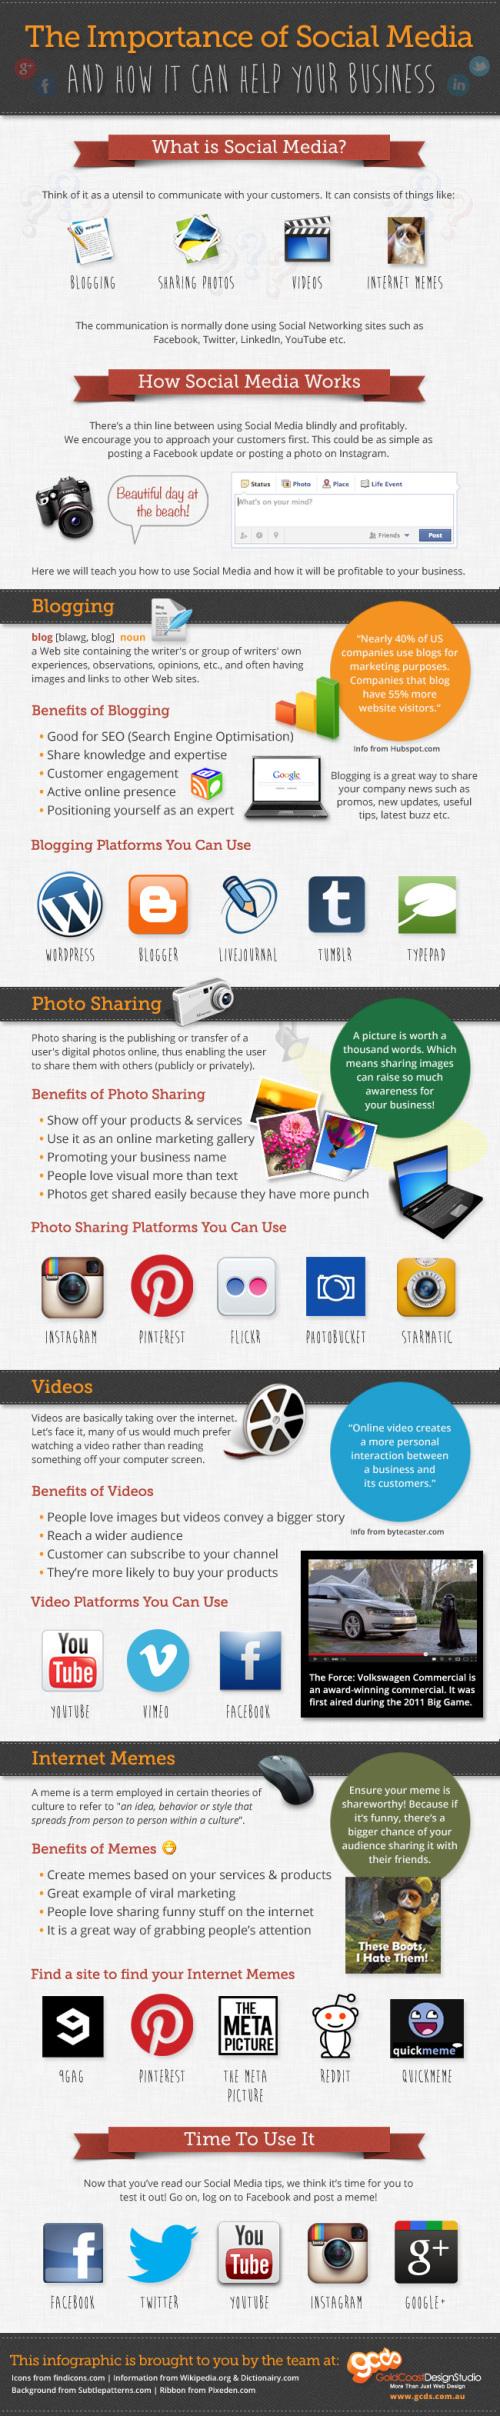 importancia-social-media